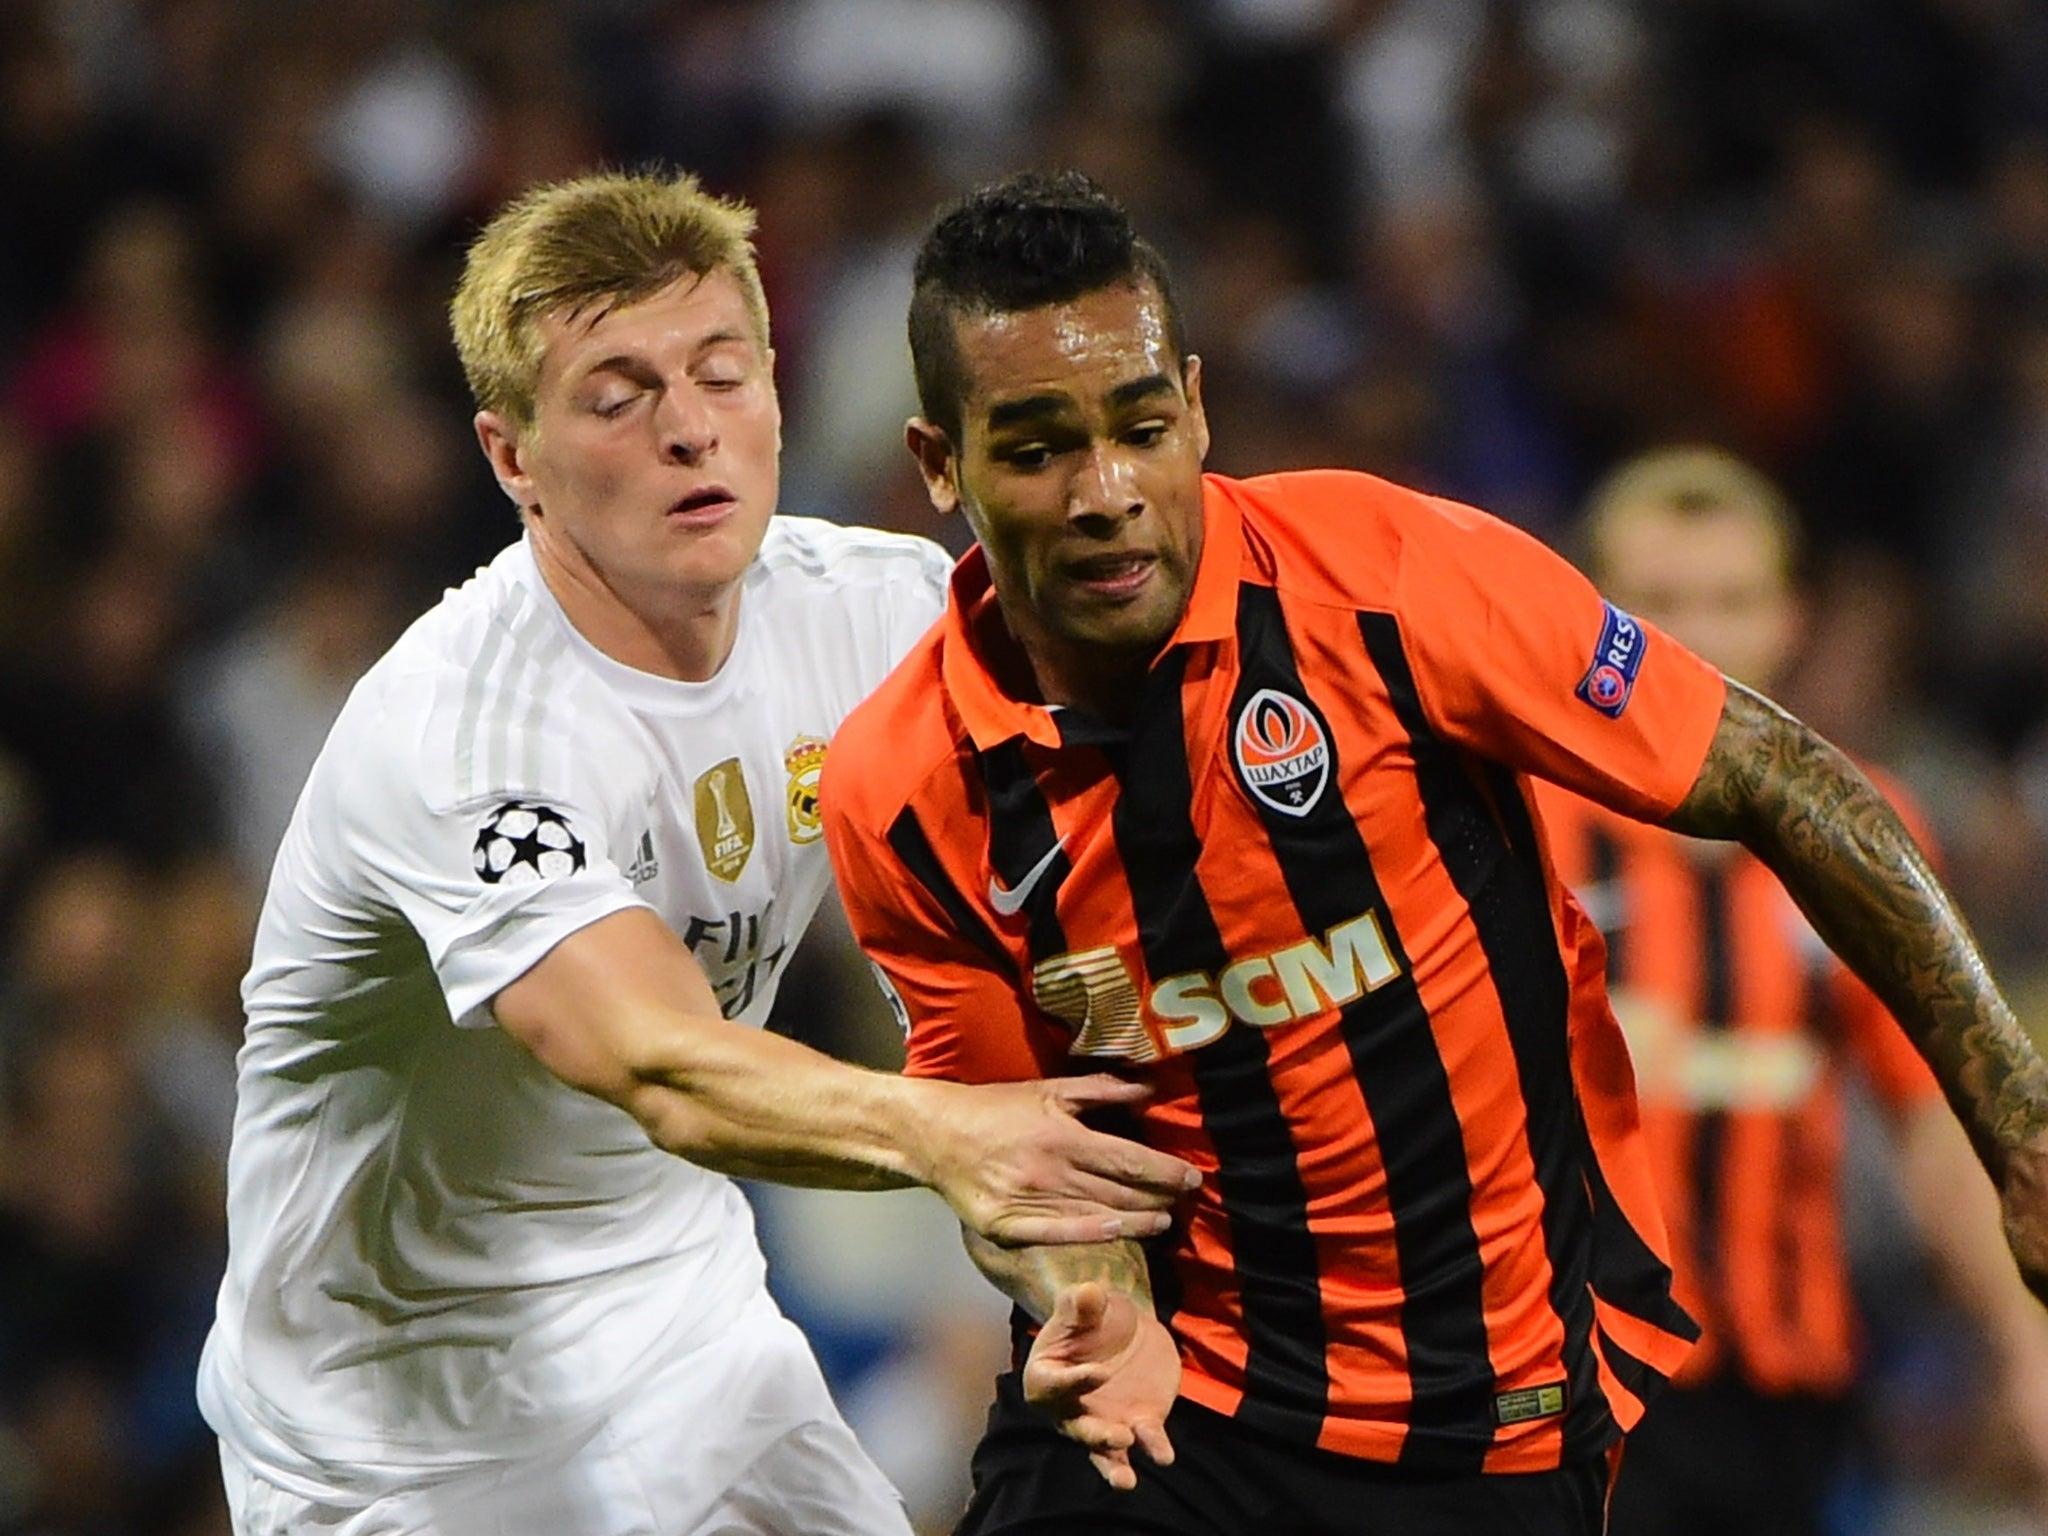 Jurgen Klopp defends Liverpool s refusal to pay £38m for Alex